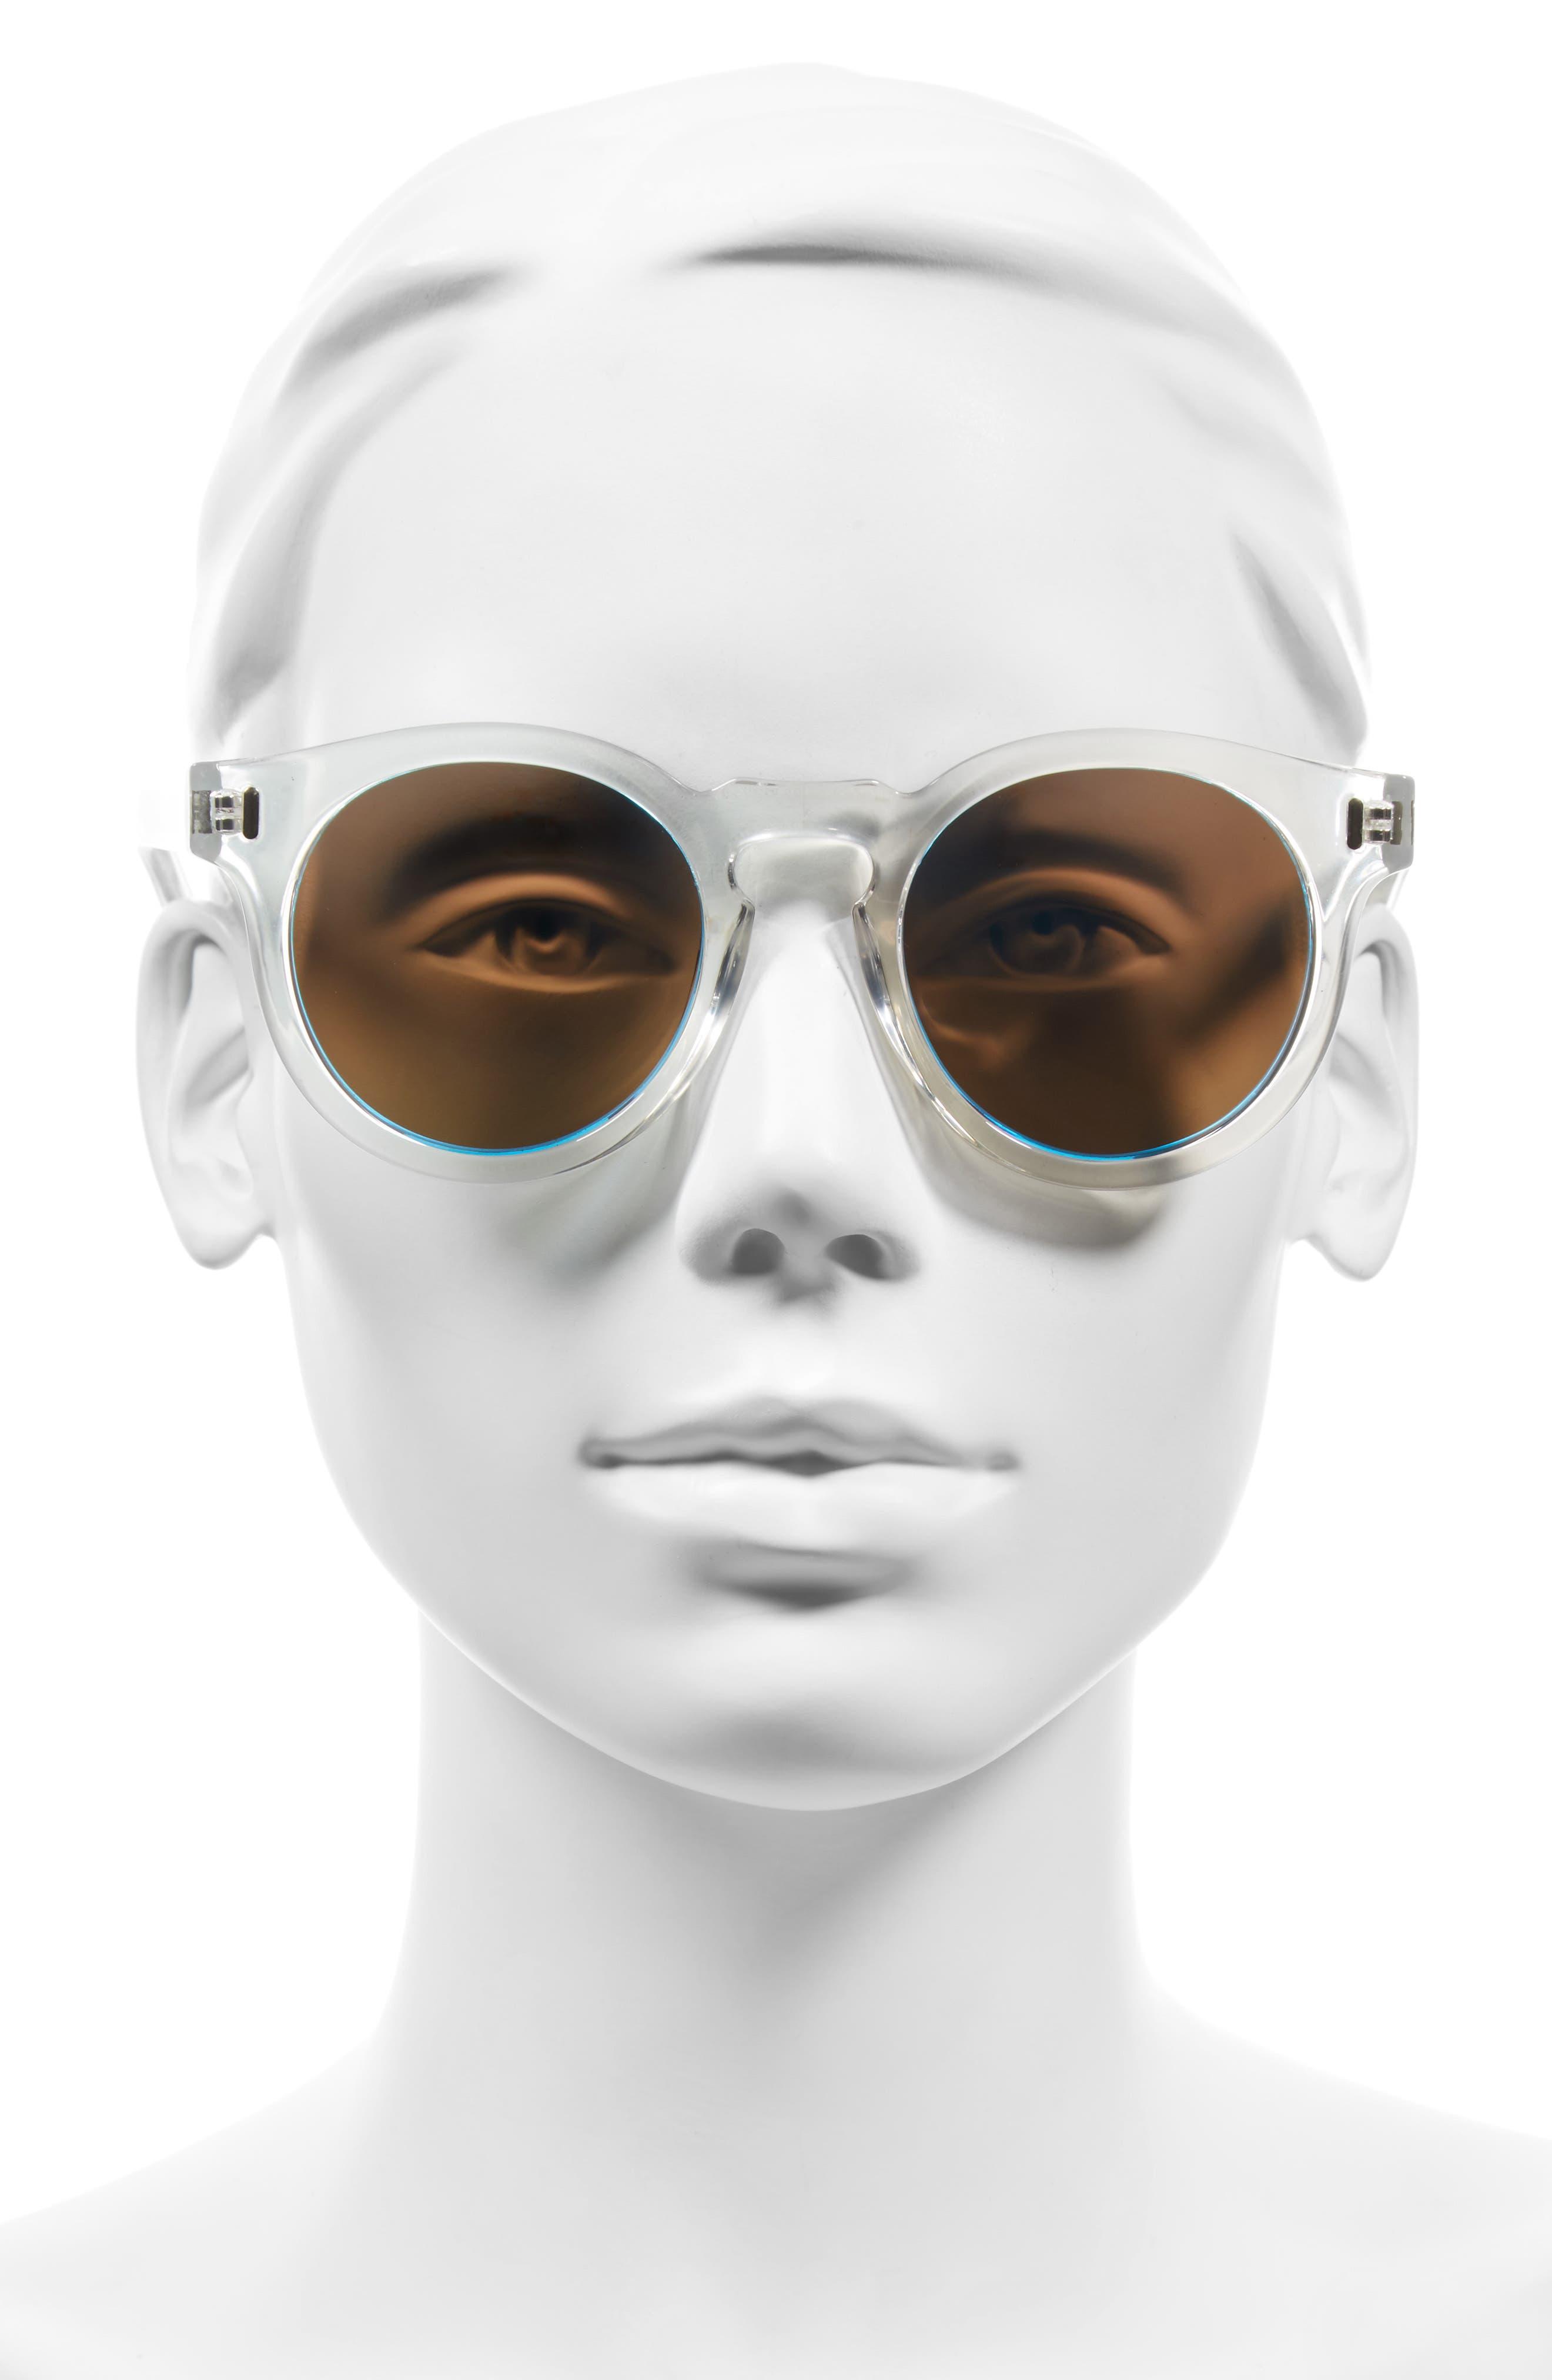 Hill 50mm Polarized Sunglasses,                             Alternate thumbnail 3, color,                             Ocean Eyes Blue